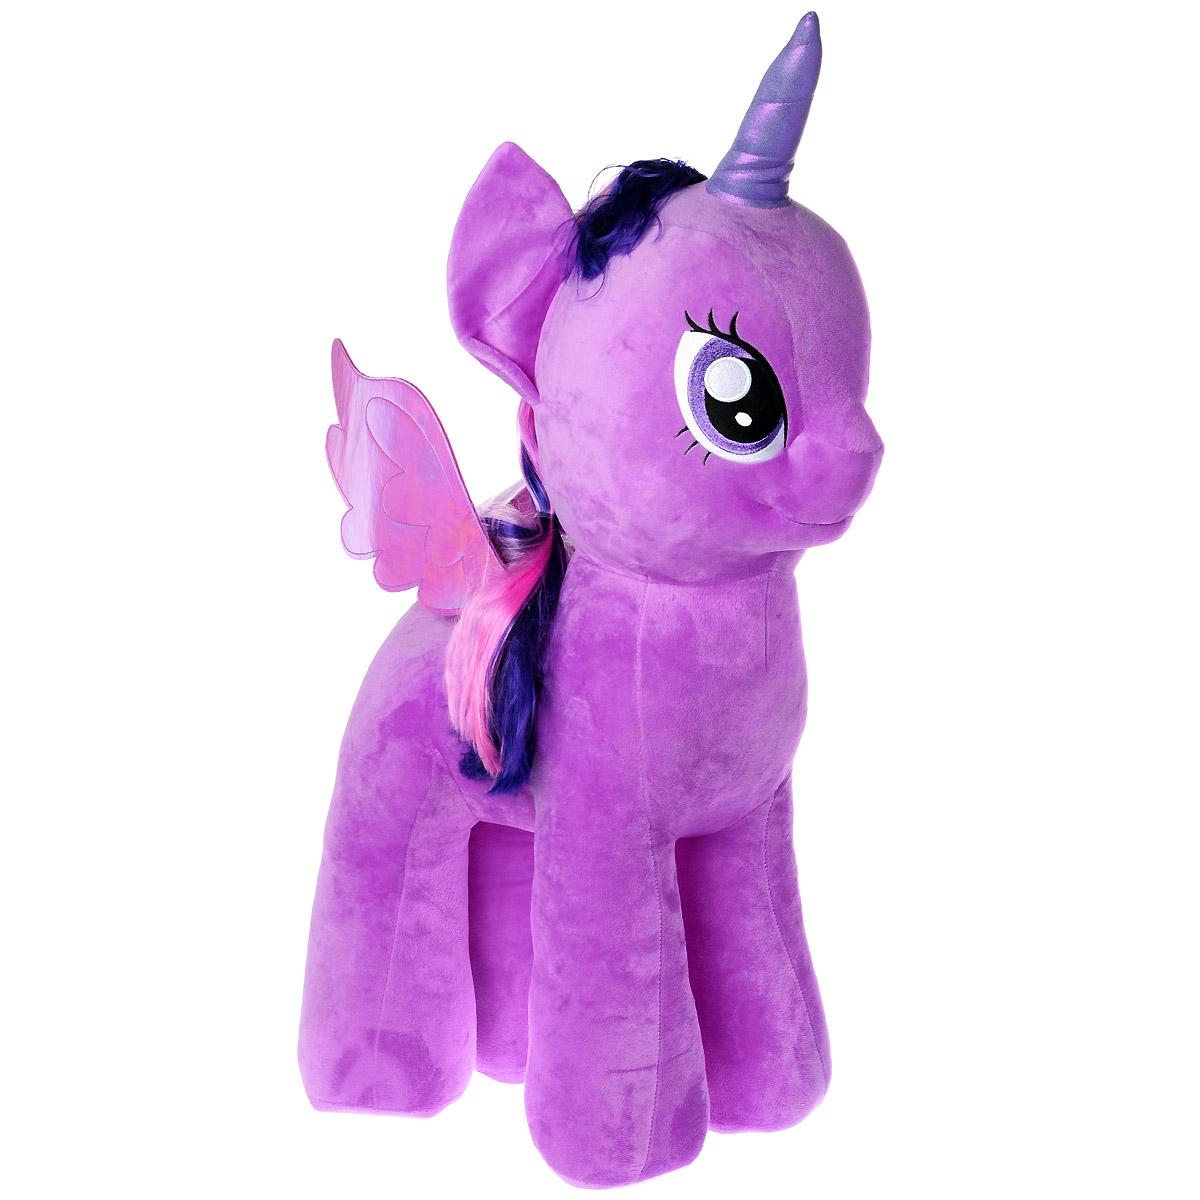 My Little Pony Мягкая игрушка Пони Twilight Sparkle, 76 см ty мягкая игрушка брелок пони apple jack 10 см